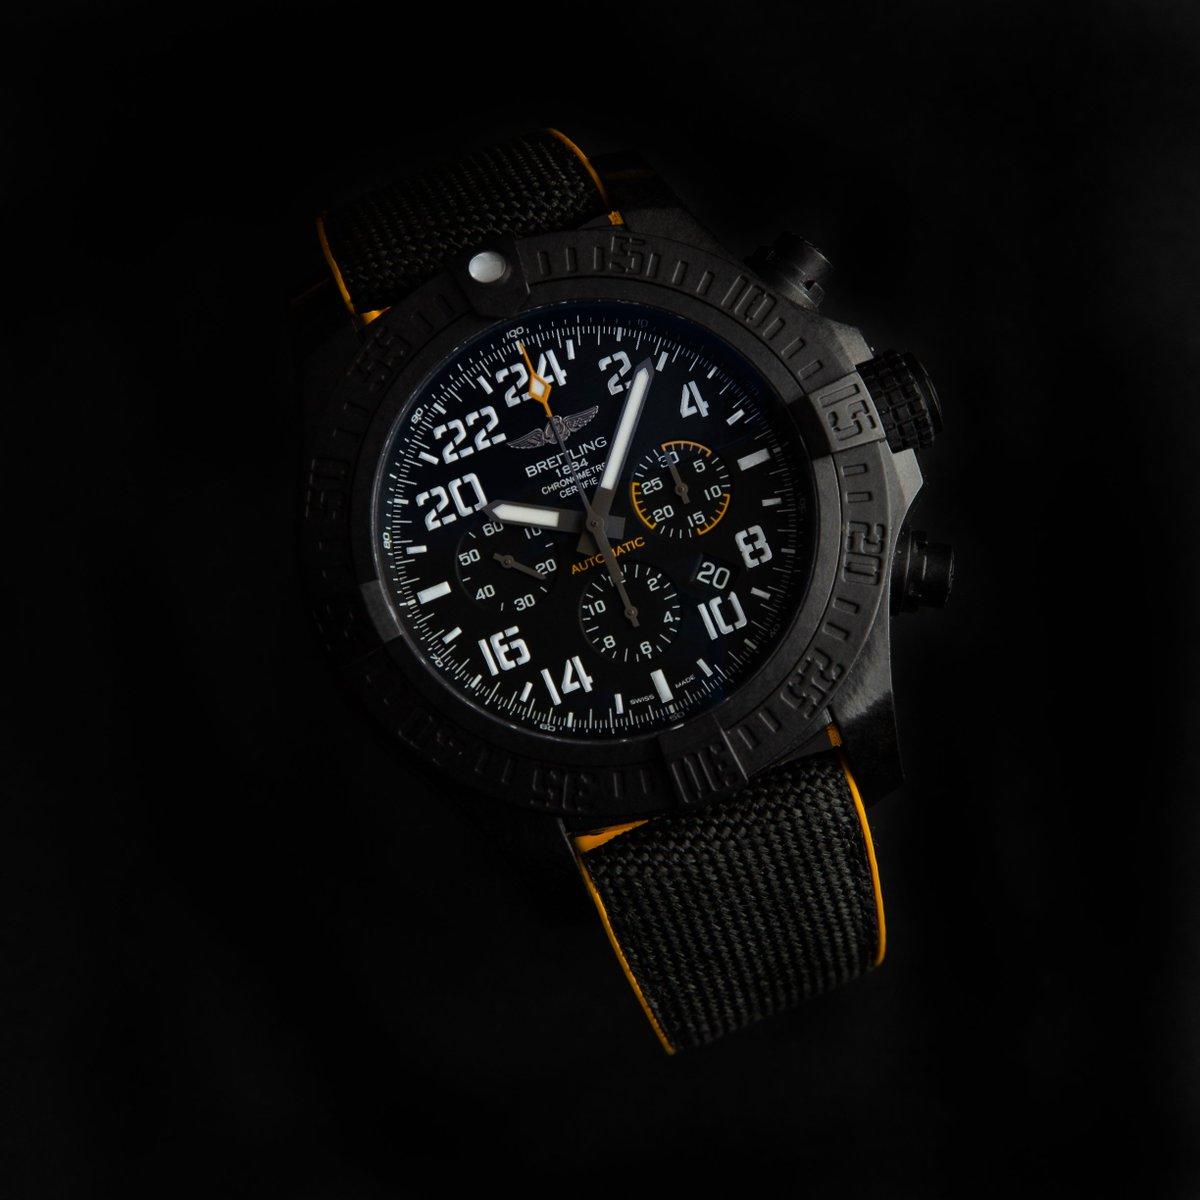 The #Breitling Avenger Hurricane 45 Breitlight XB0180E4/BF31.  Shop -> http://bit.ly/2UdqLFj  Follow @WatchBox_Global for more!  #WatchBox #BreitlingWatches #avenger #breitlingavenger #WatchFam #MarvelComicspic.twitter.com/PFmoIcUqtw